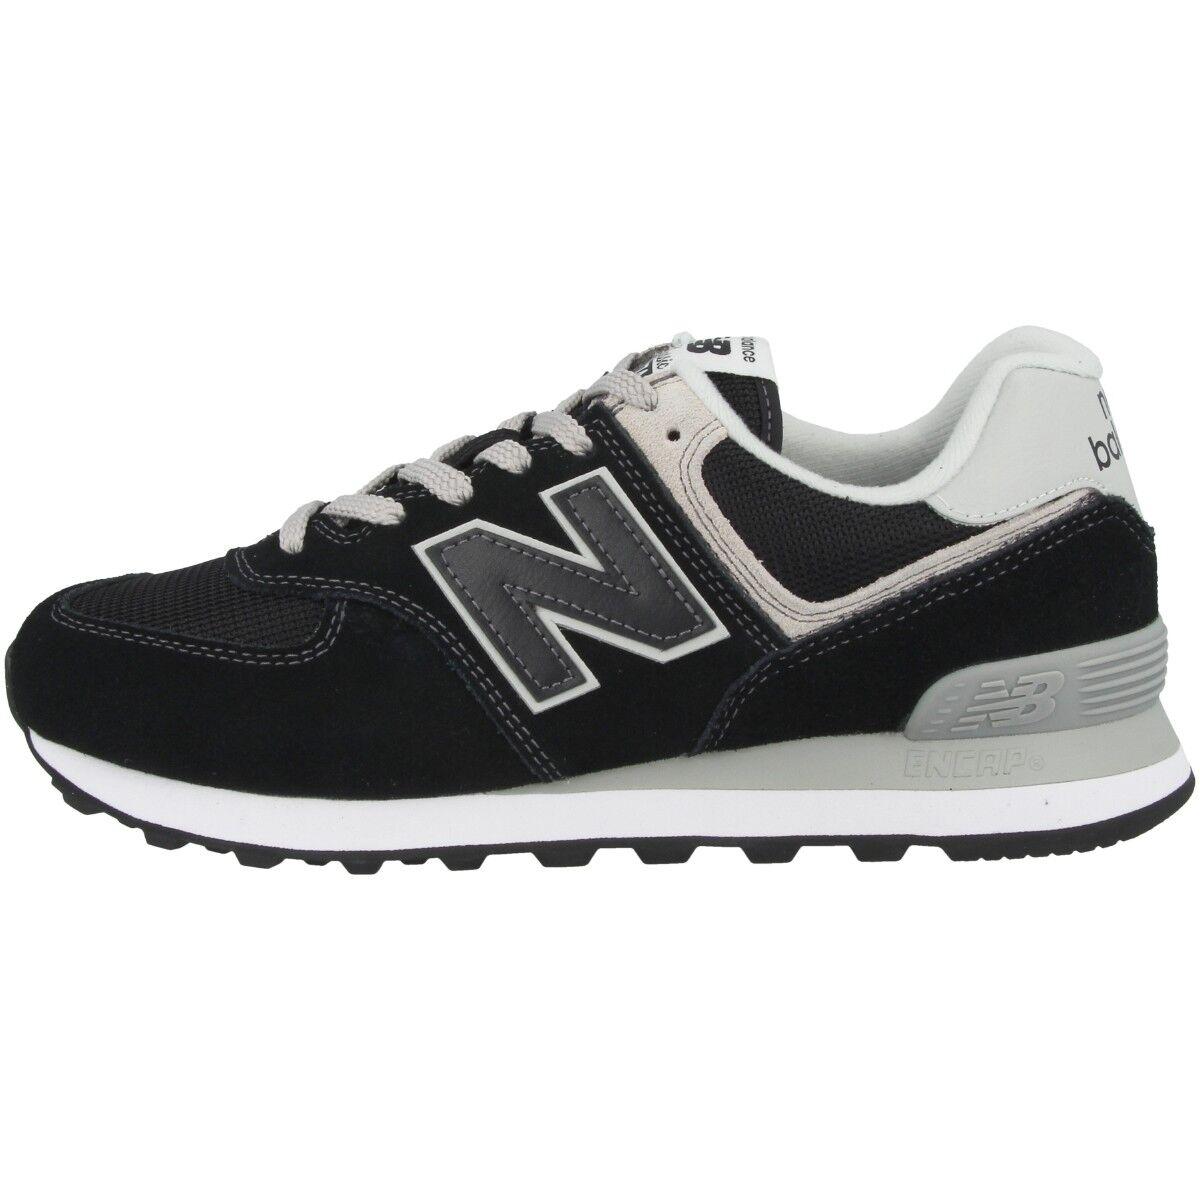 New New New Balance WL 574 EB Women Schuhe Damen Freizeit Sneaker black white WL574EB b9a962